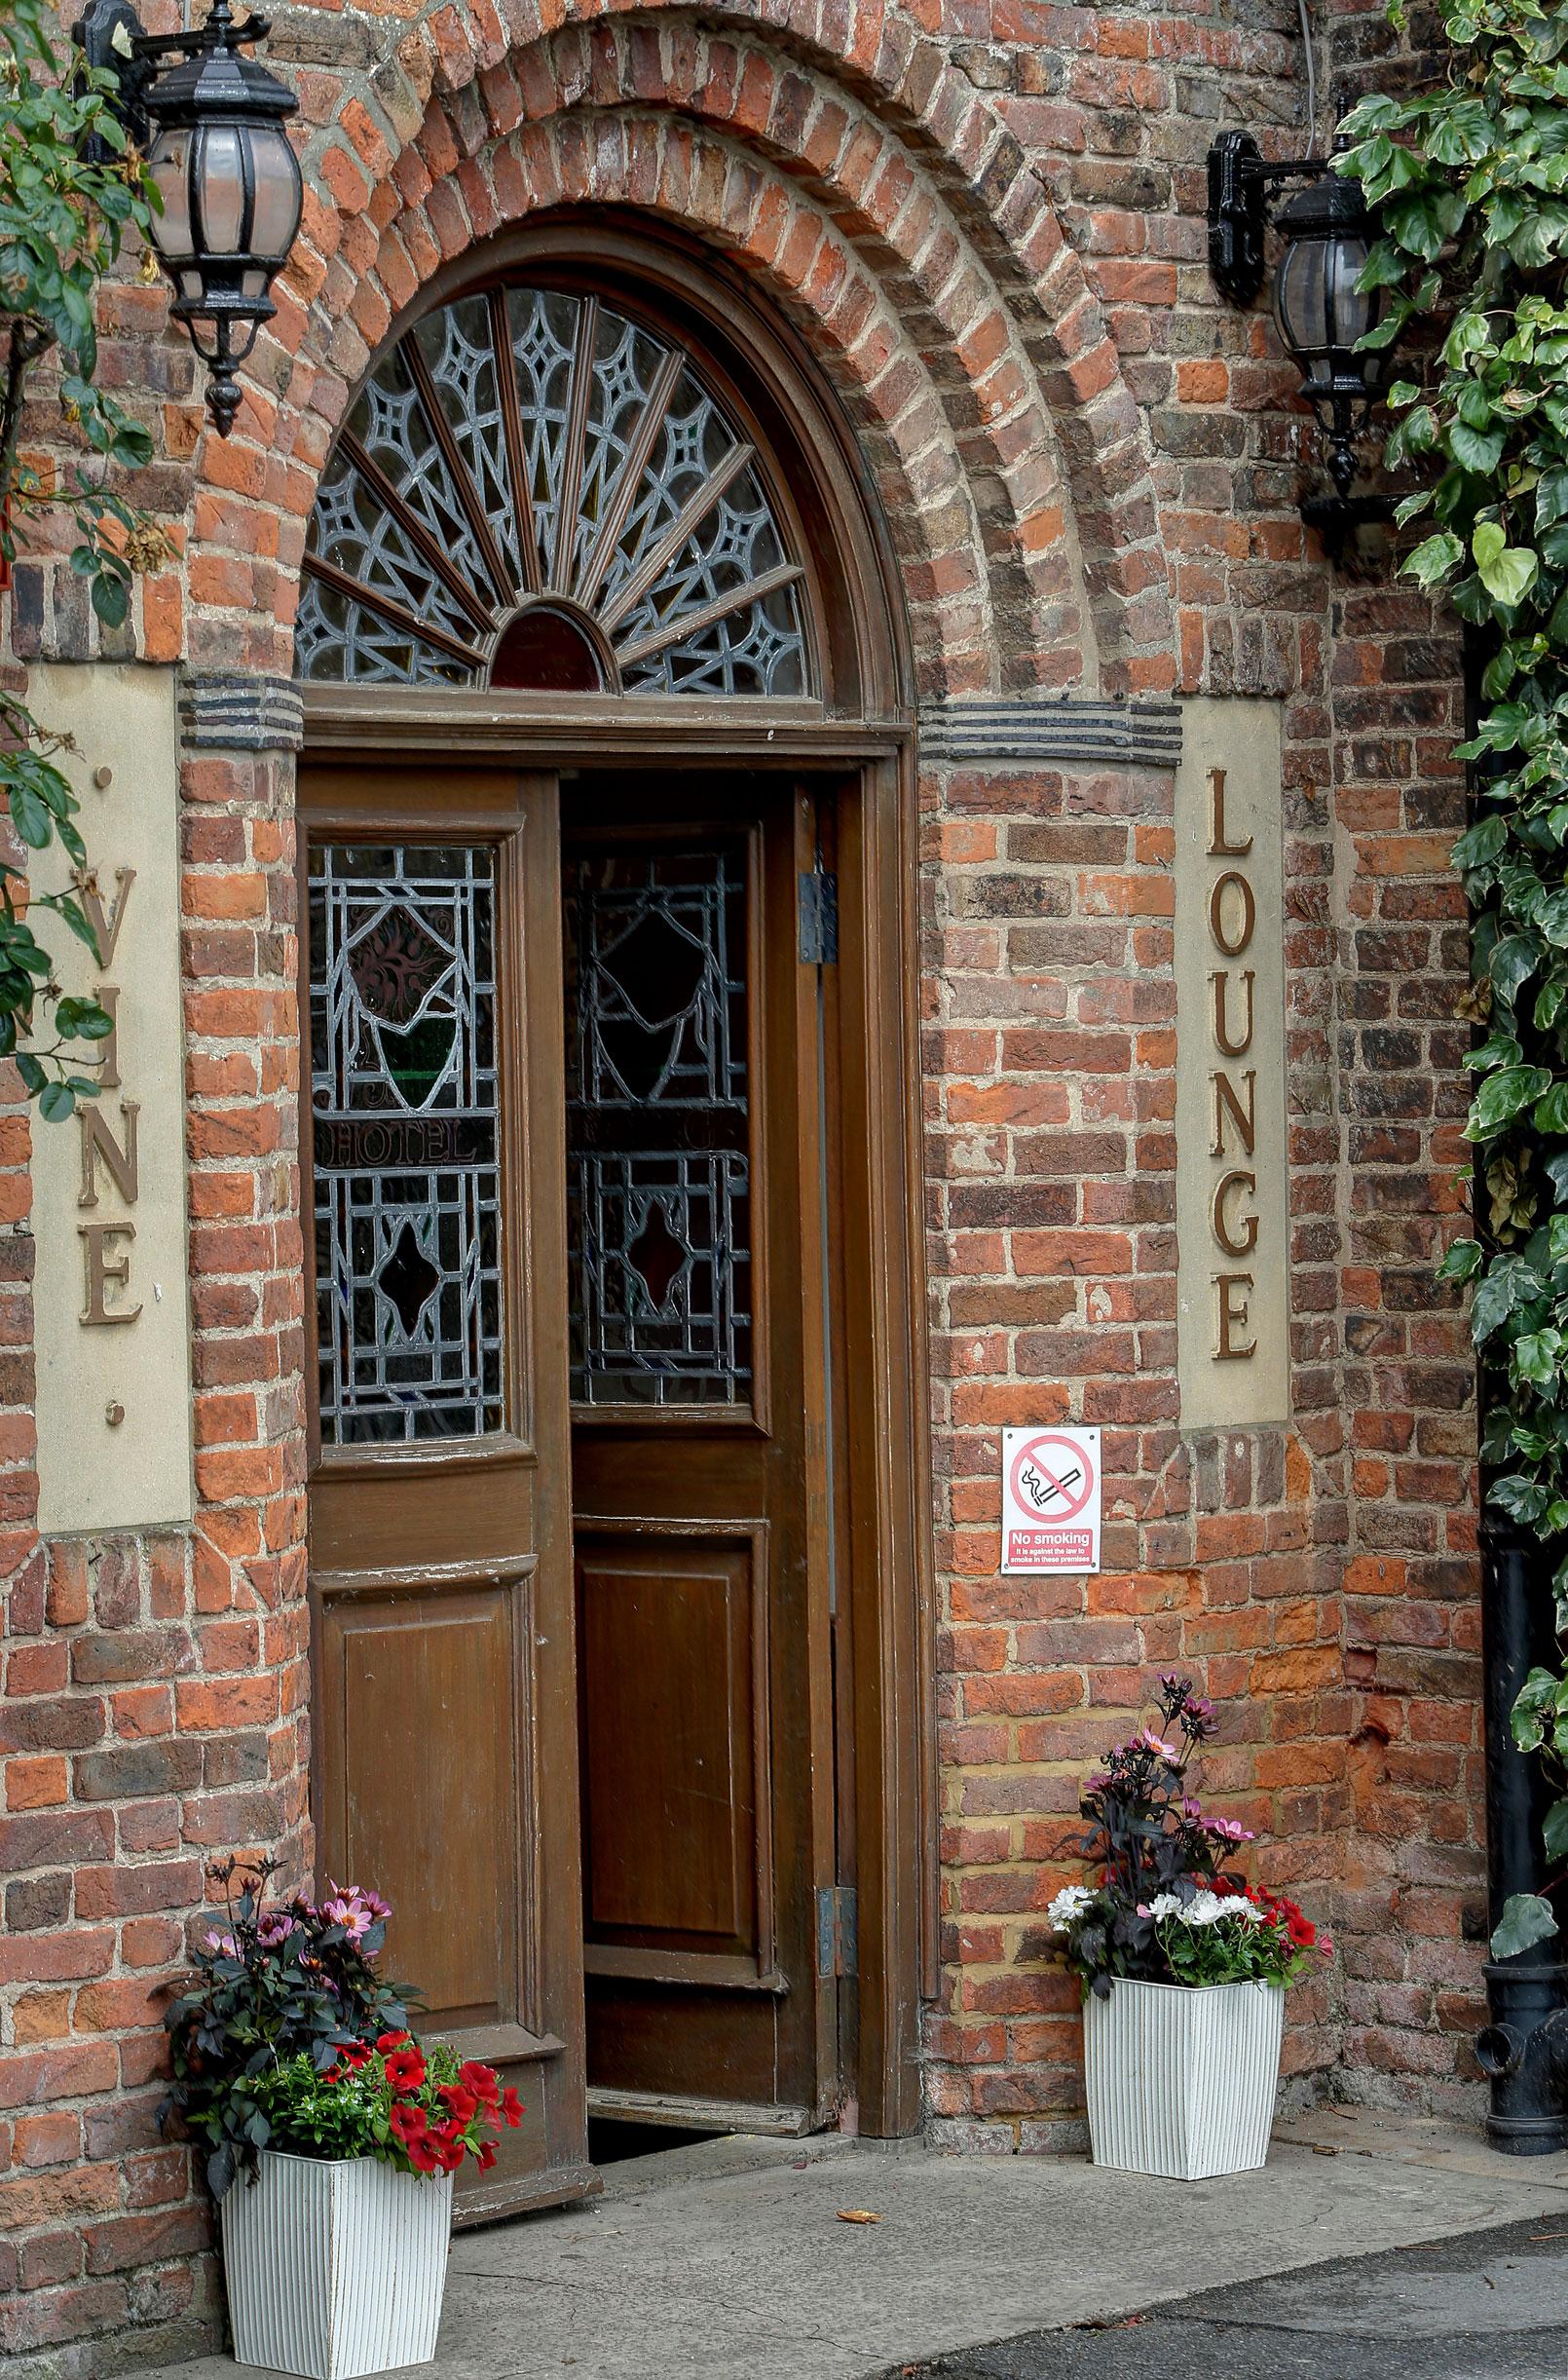 Best Western Hotel Room: Hotels In Skegness, Lincolnshire